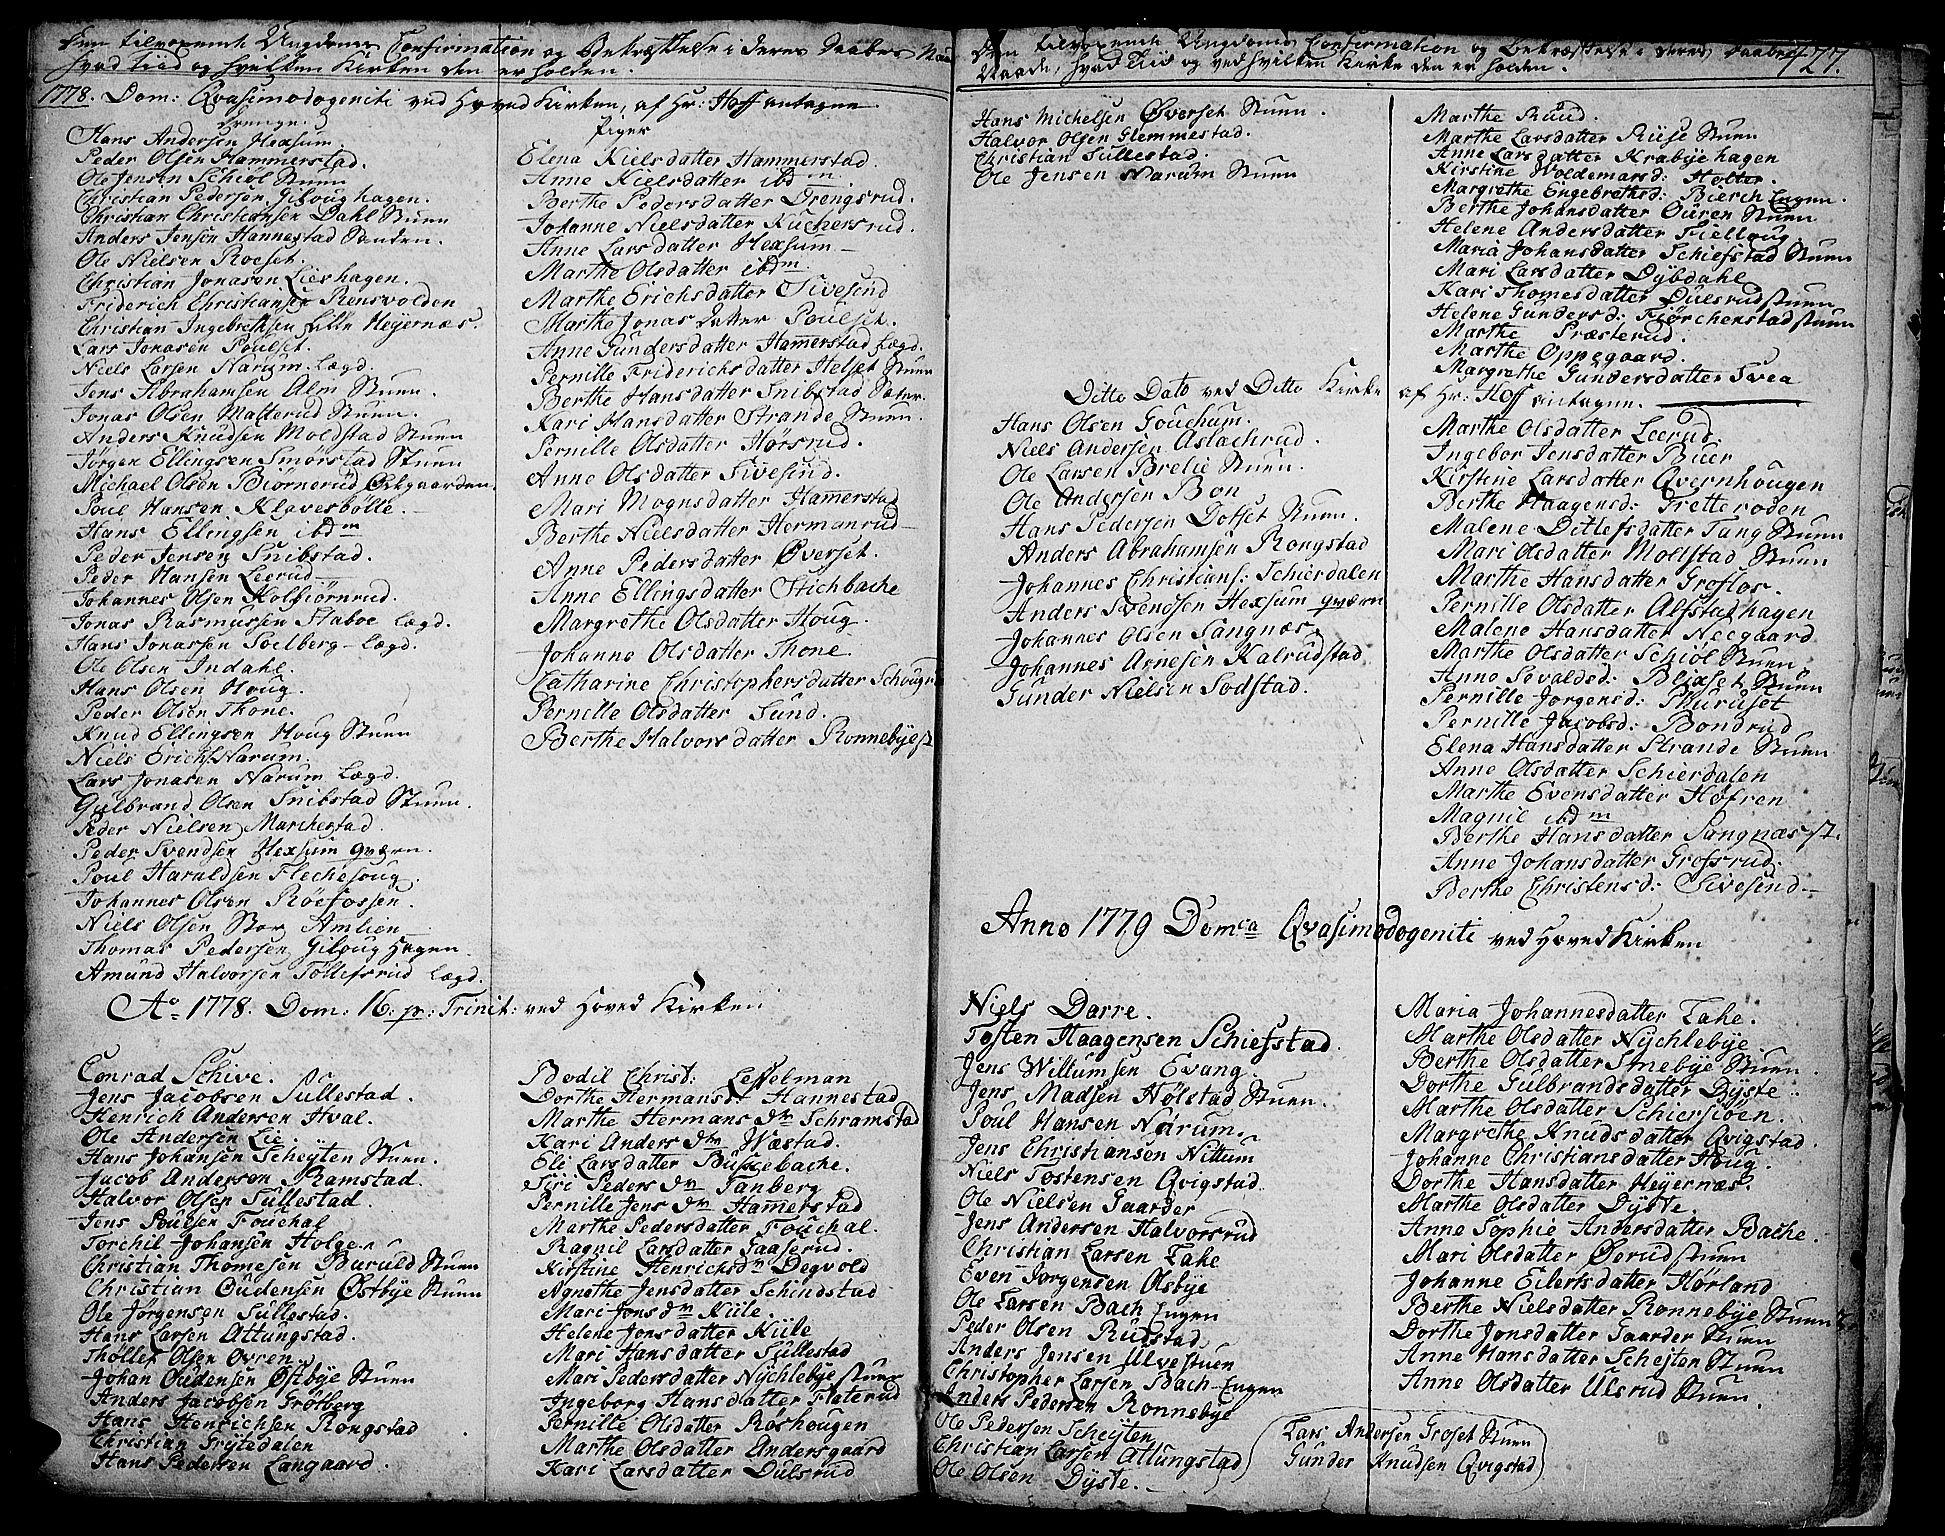 SAH, Toten prestekontor, Ministerialbok nr. 6, 1773-1793, s. 427